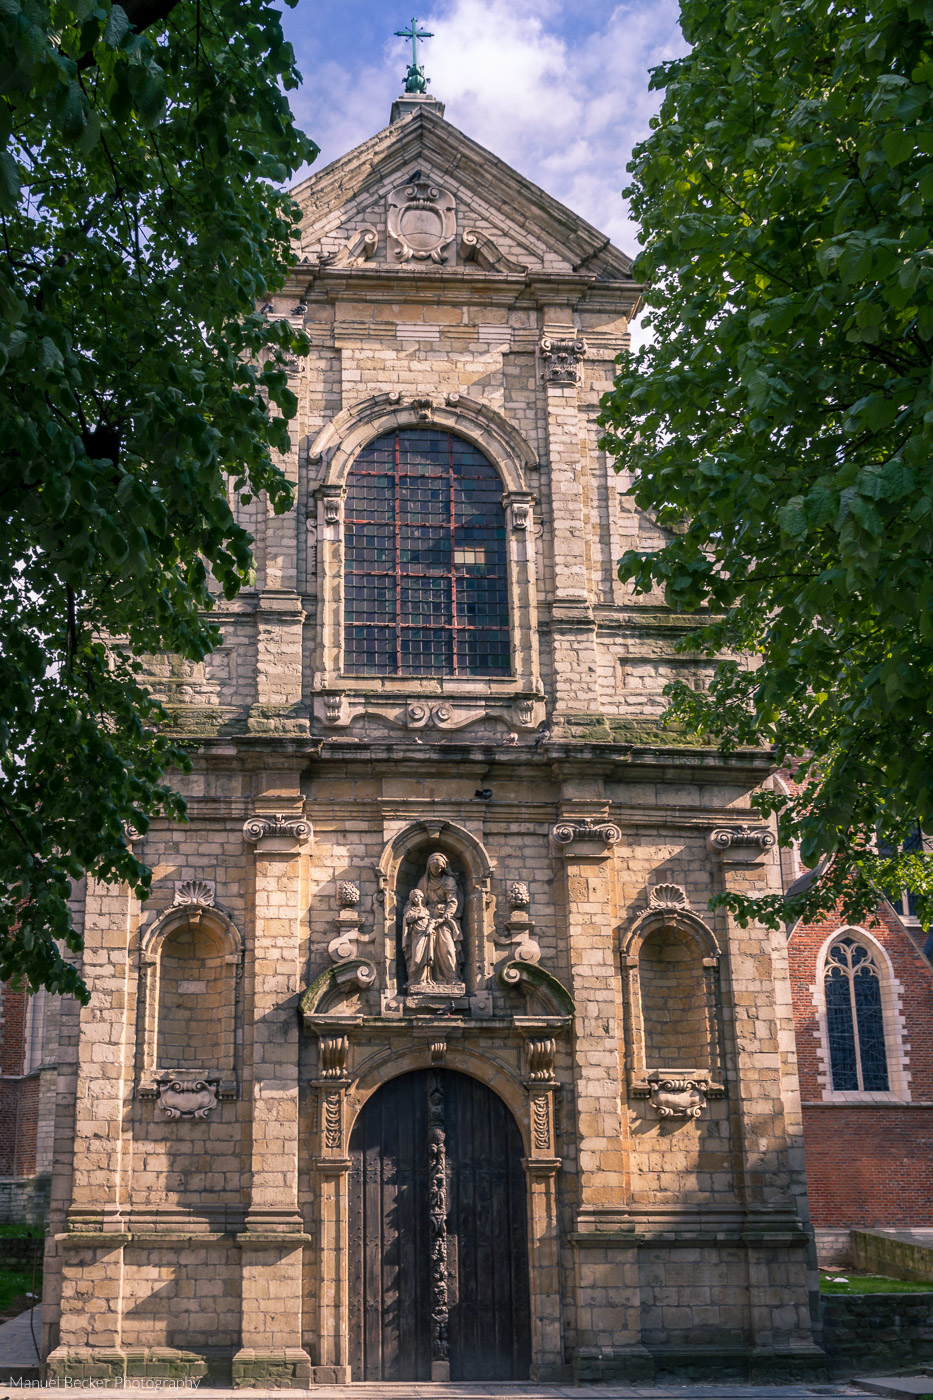 Eglise Sainte Marie Madeleine, Brussels, Belgium